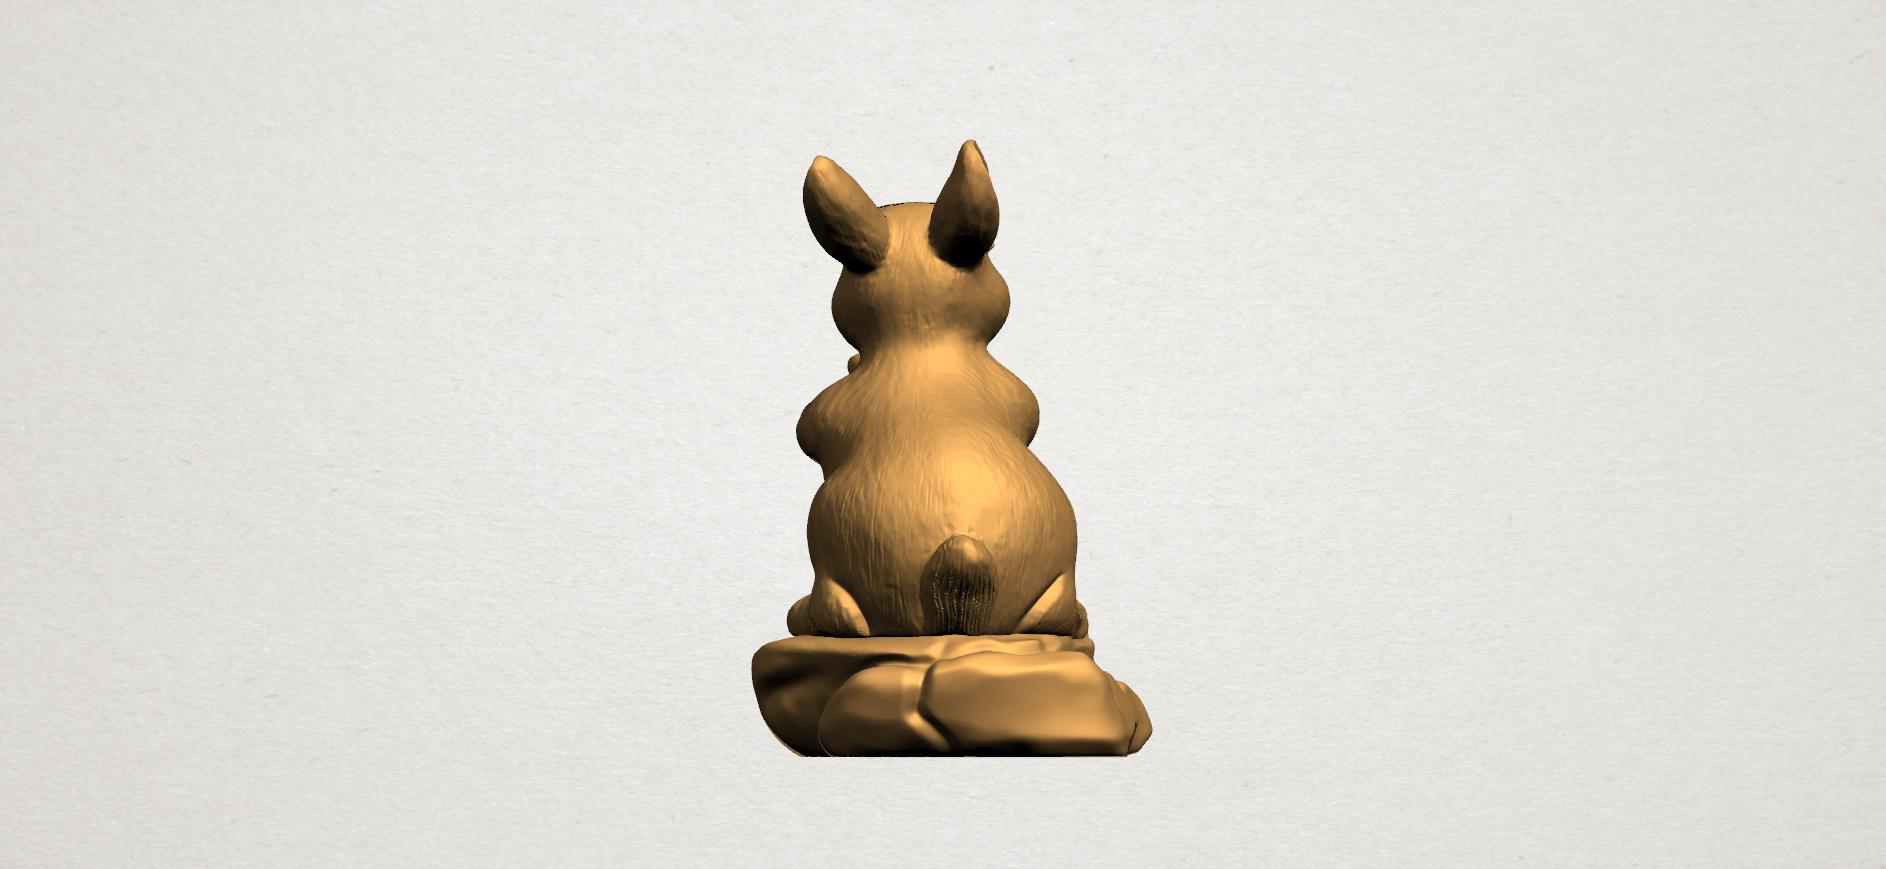 Chinese Horoscope04-A04.png Télécharger fichier STL gratuit Horoscope Chinois 04 Lapin • Design à imprimer en 3D, GeorgesNikkei